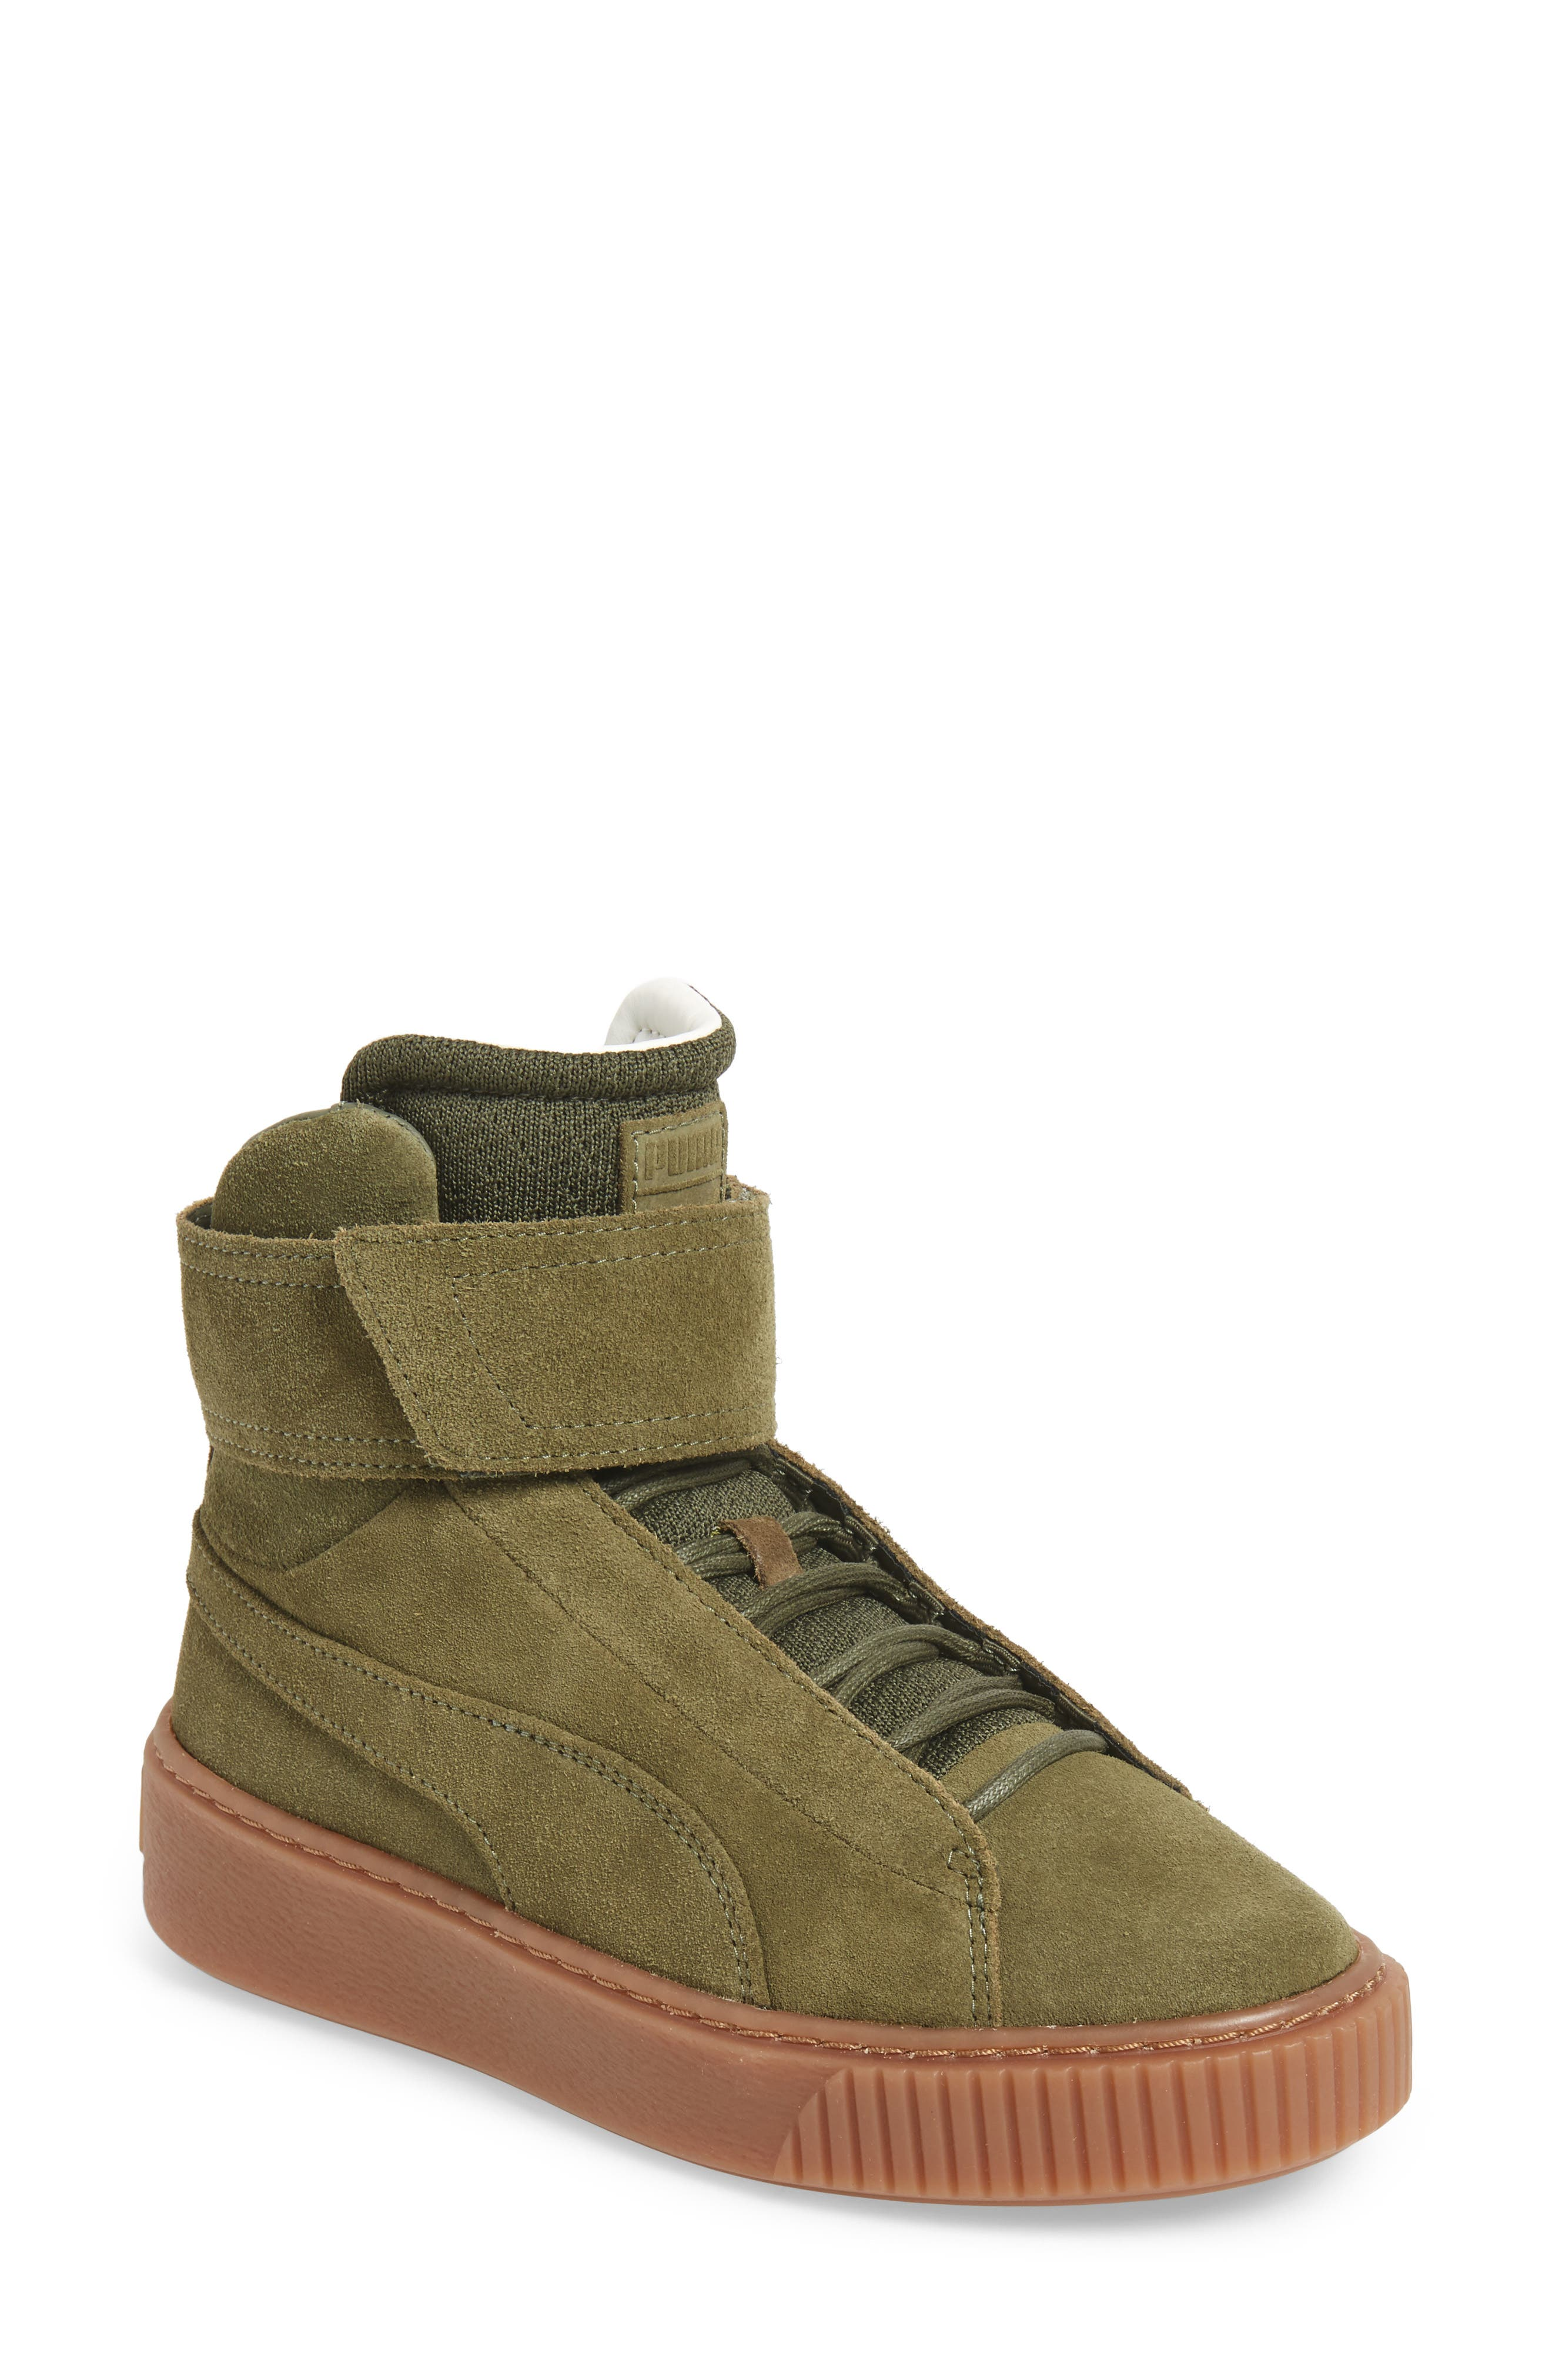 Main Image - PUMA Platform Mid OW Sneaker (Women)